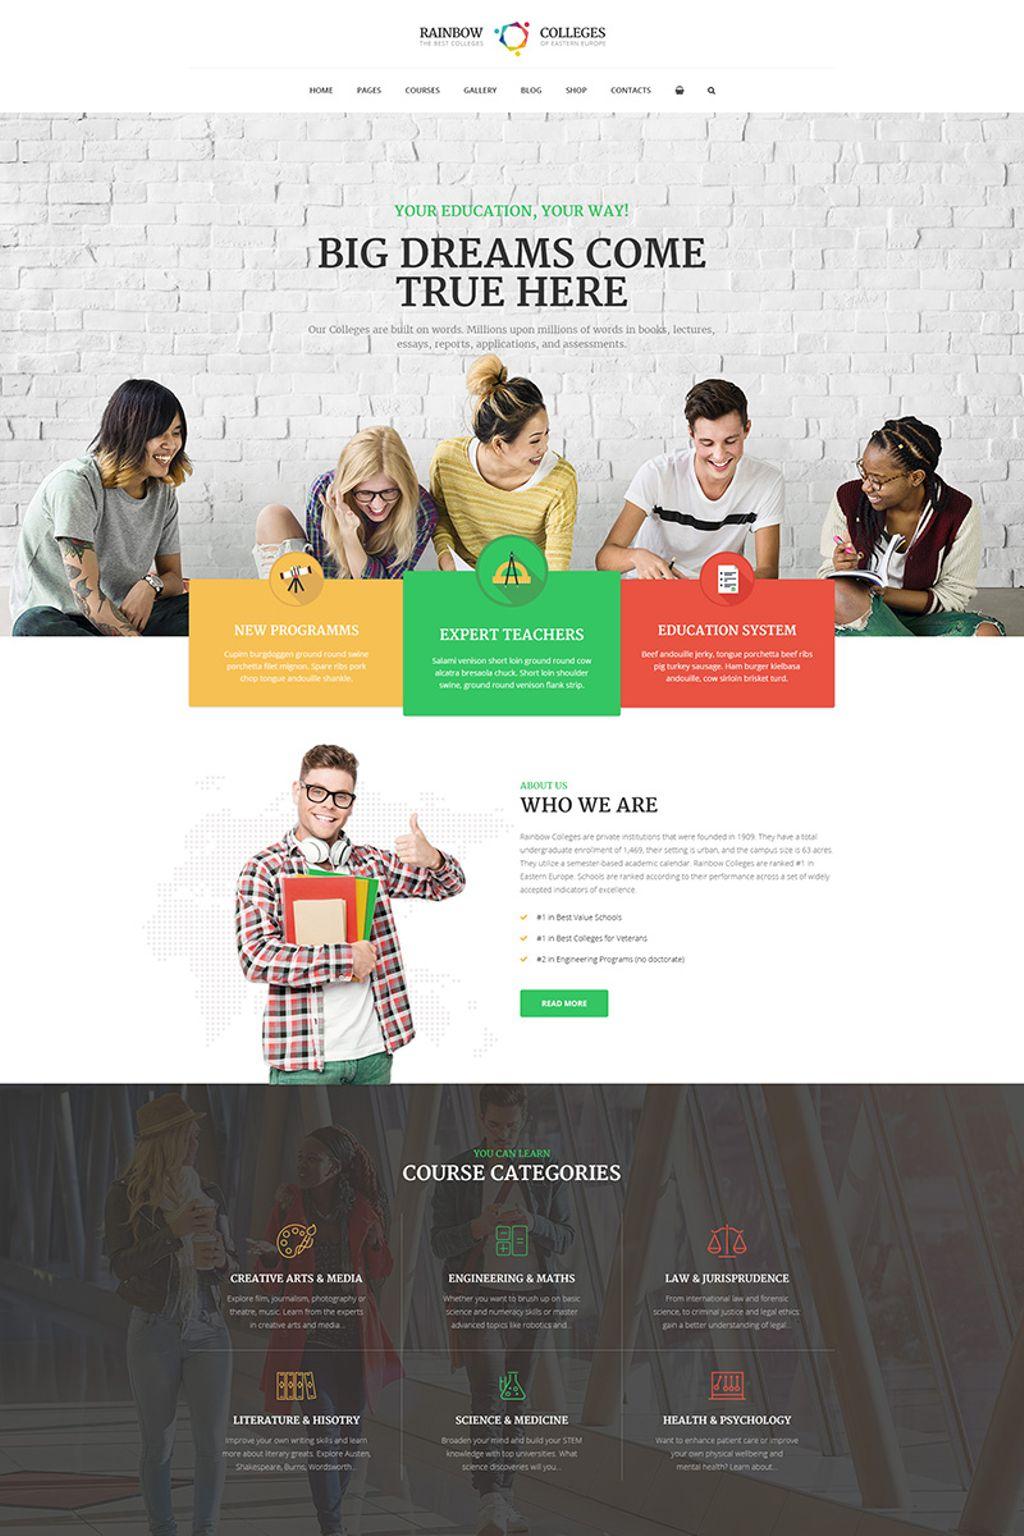 Bootstrap Rainbow Colleges - E-Course WordPress-tema #66265 - skärmbild